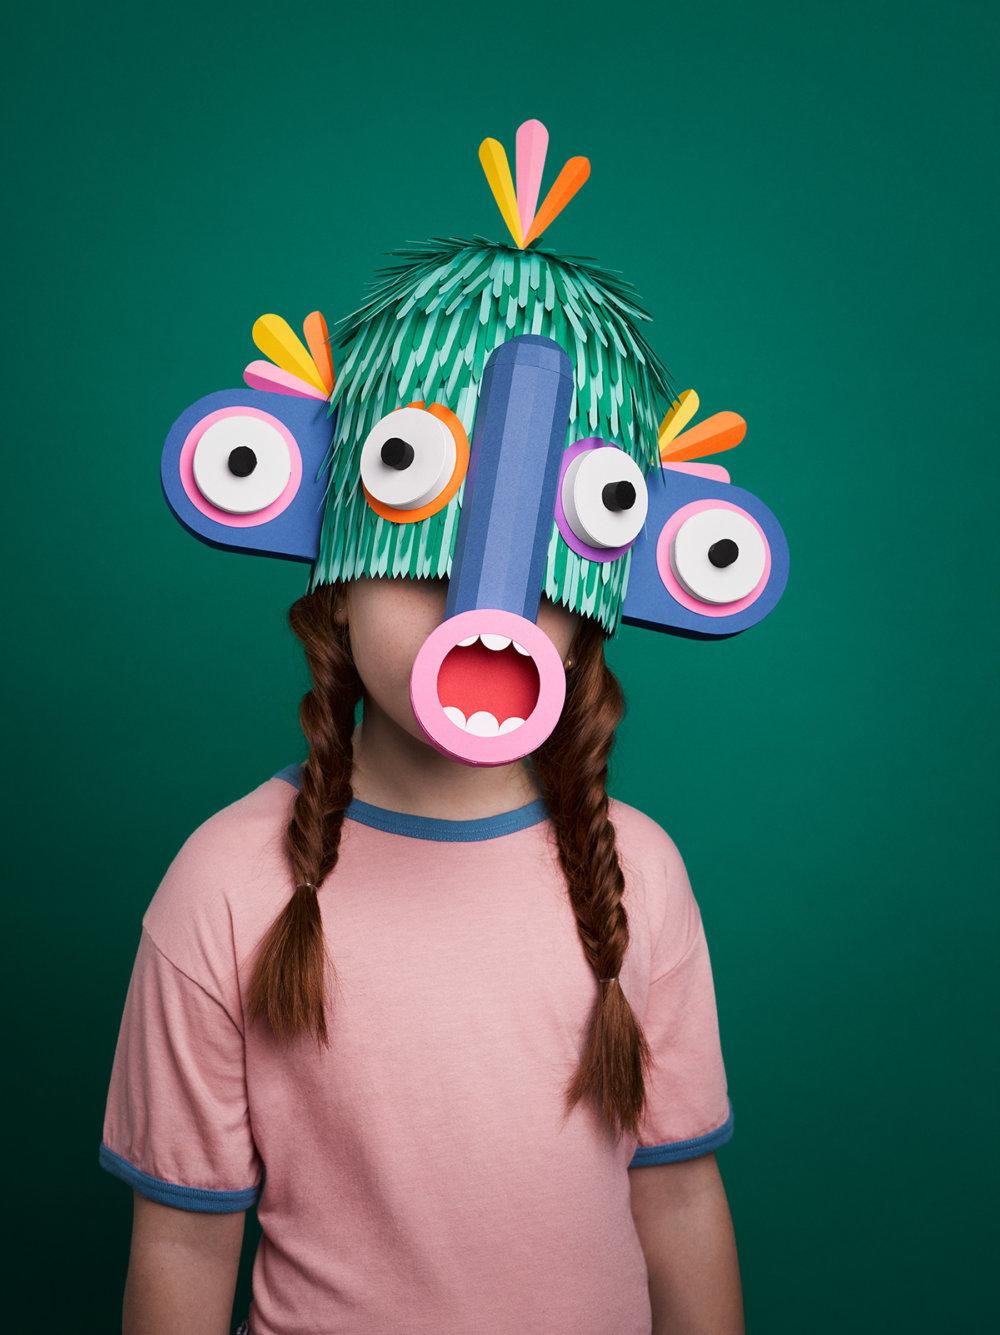 New Species Amusing Paper Masks By Lobulo Studio 1